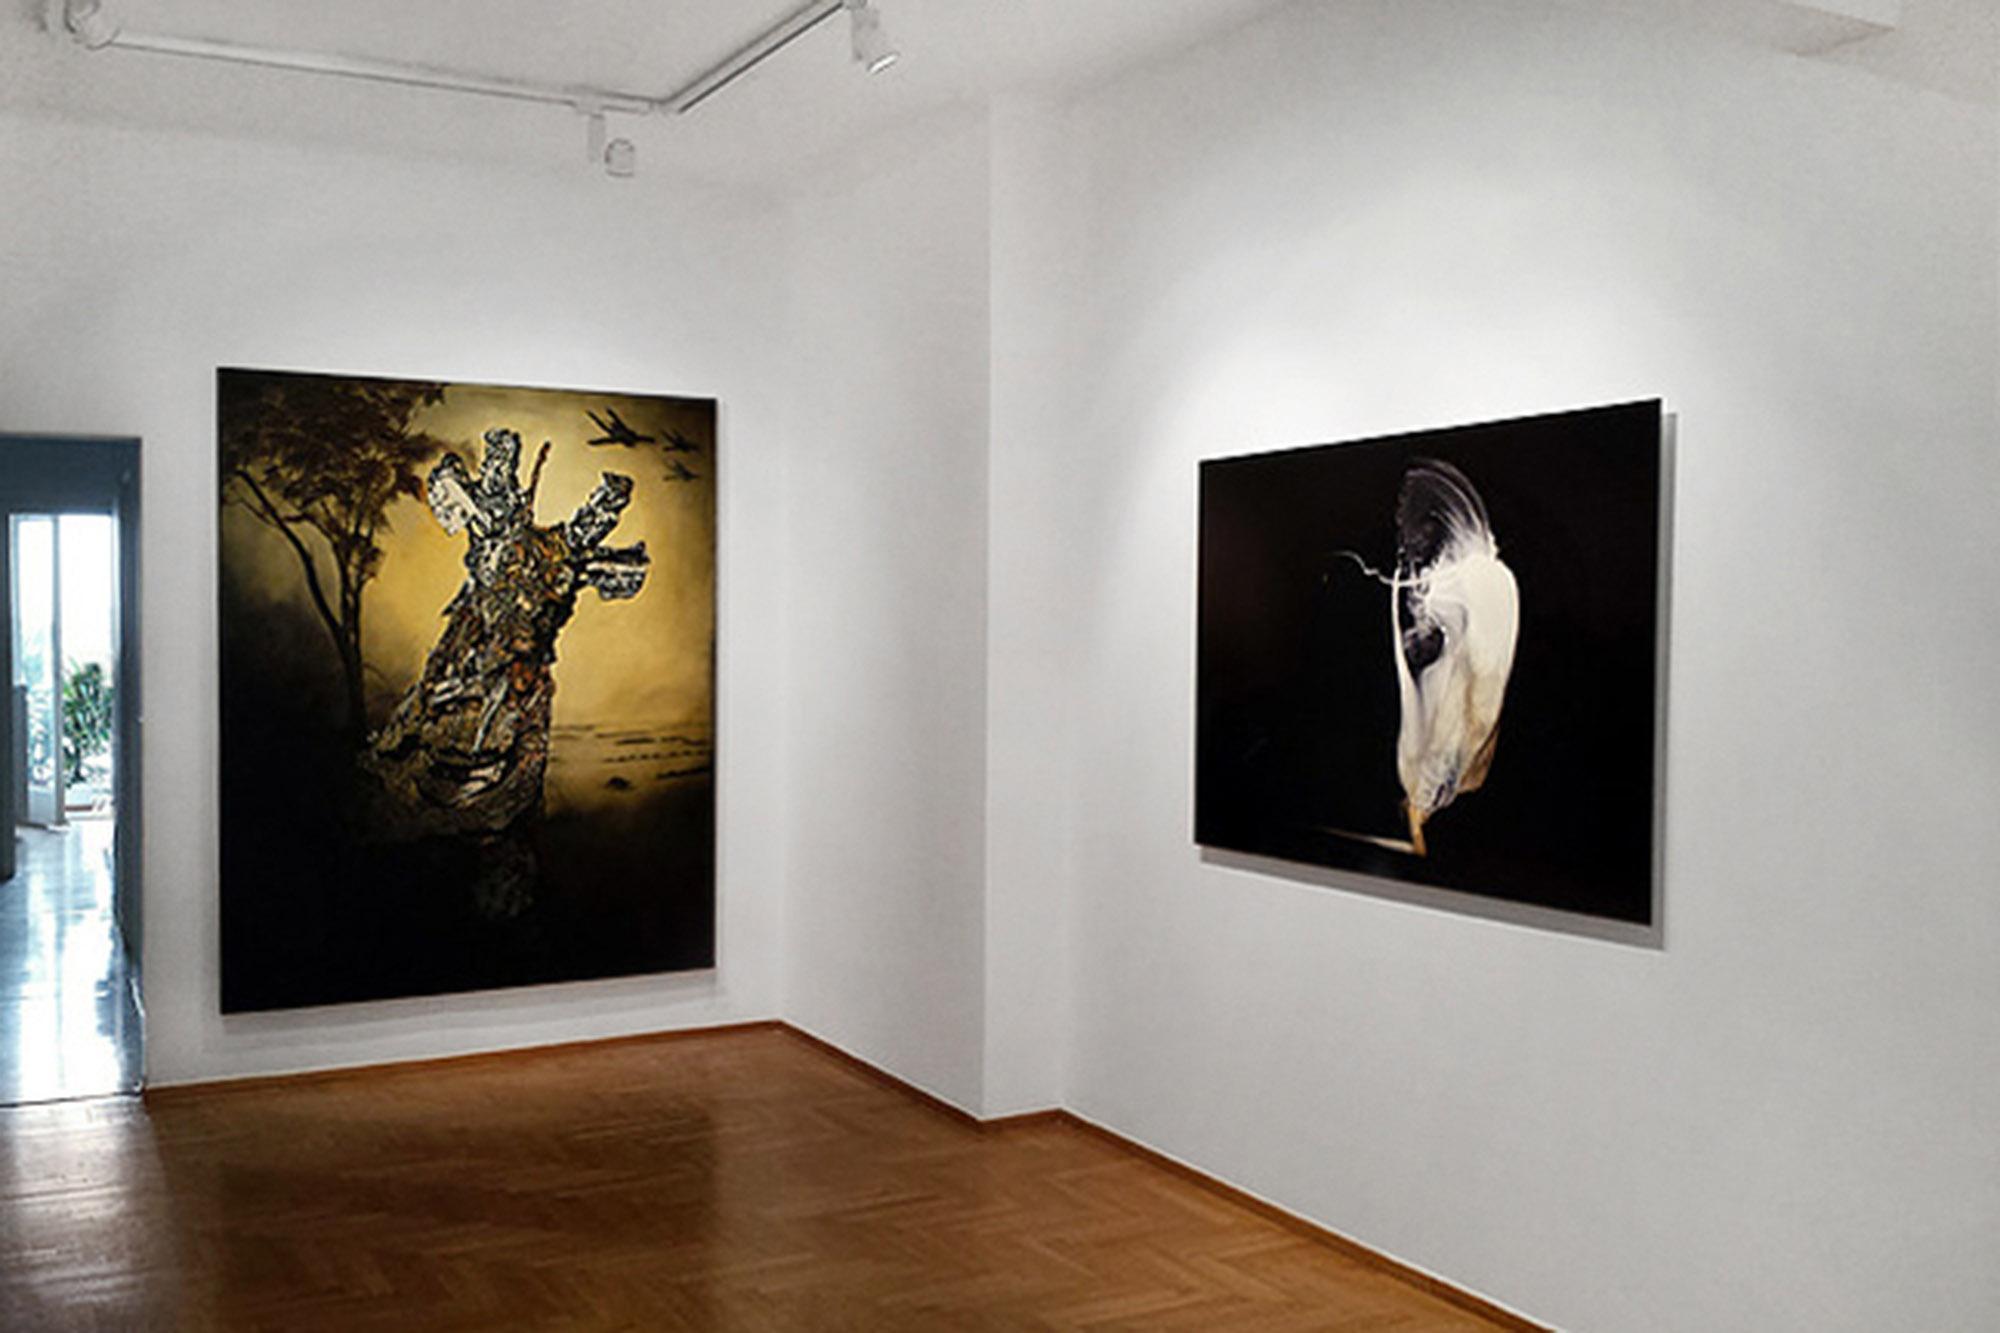 Chris Hawtin & Filippos Tsitsopoulos - Image 1